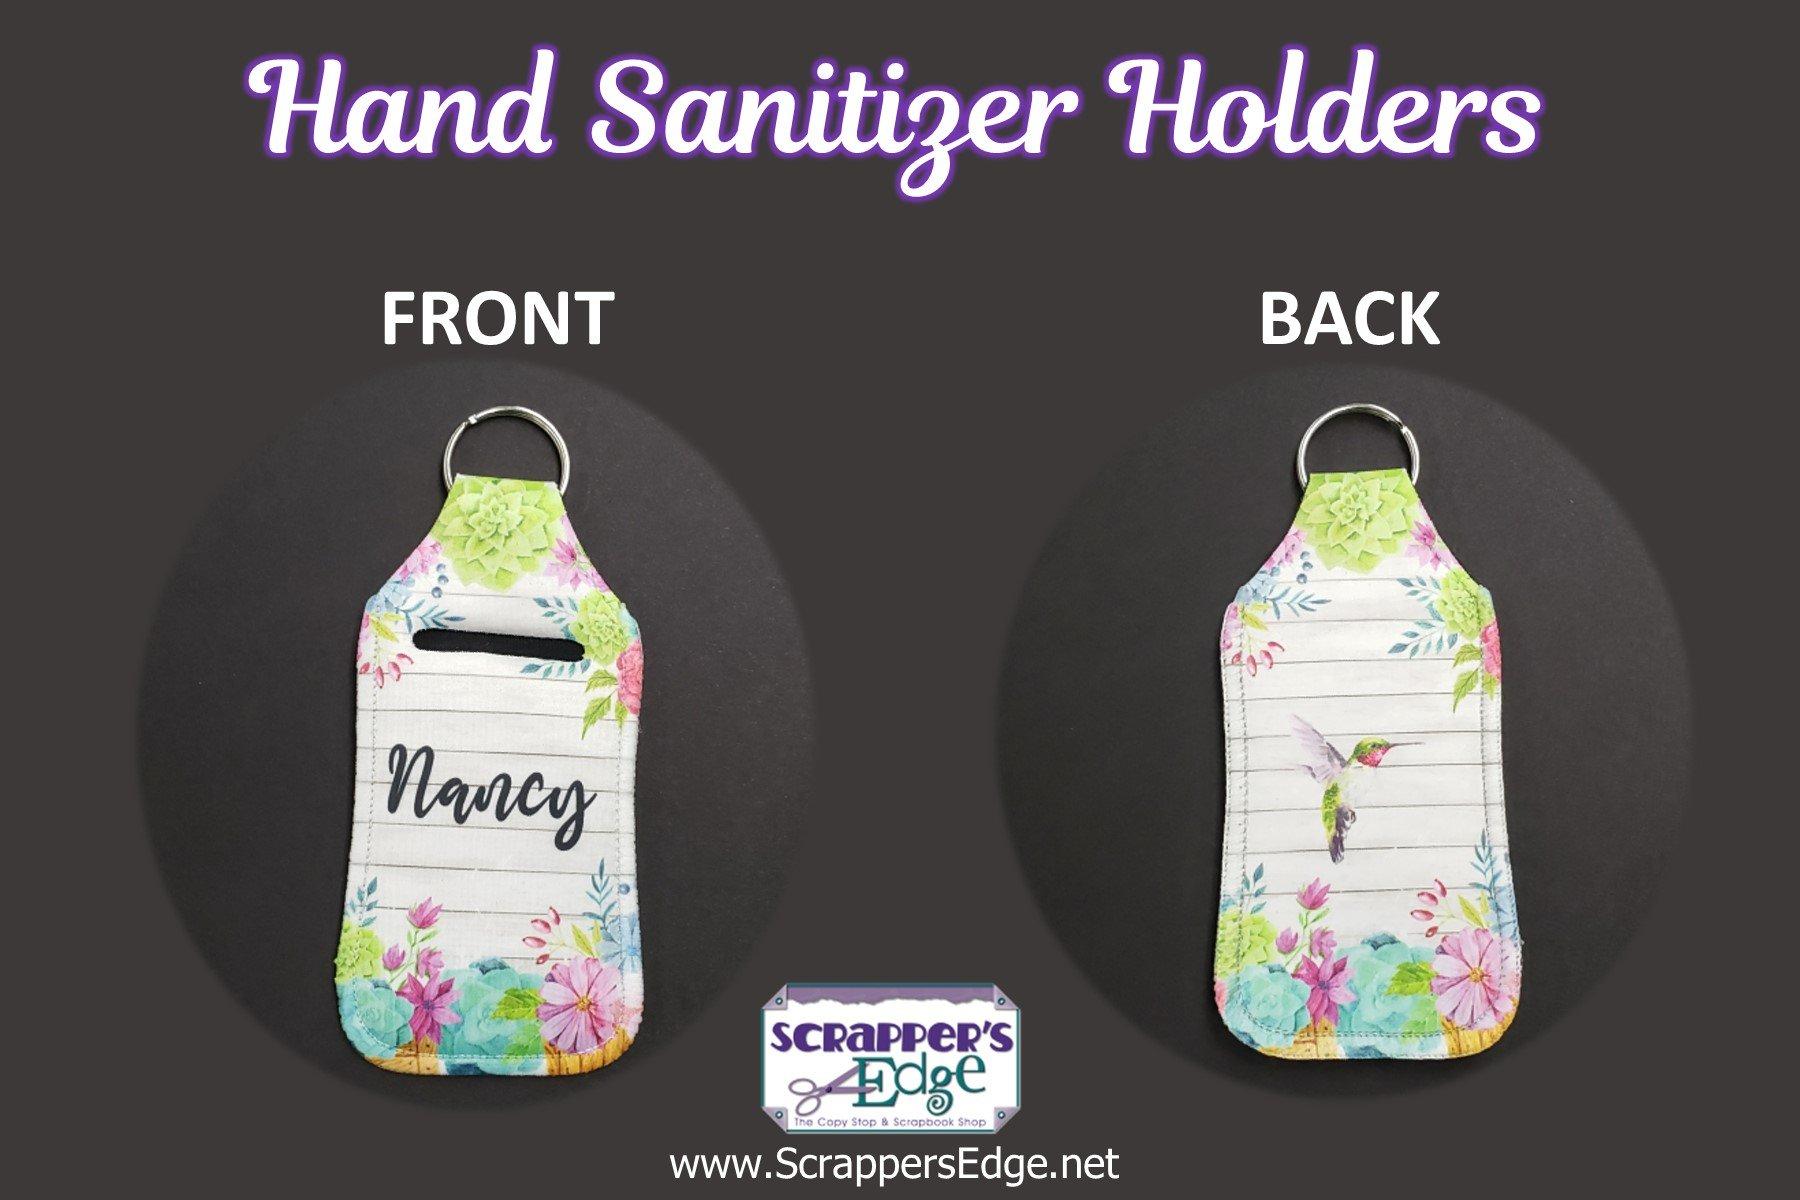 Personalized Hand Sanitizer Holder